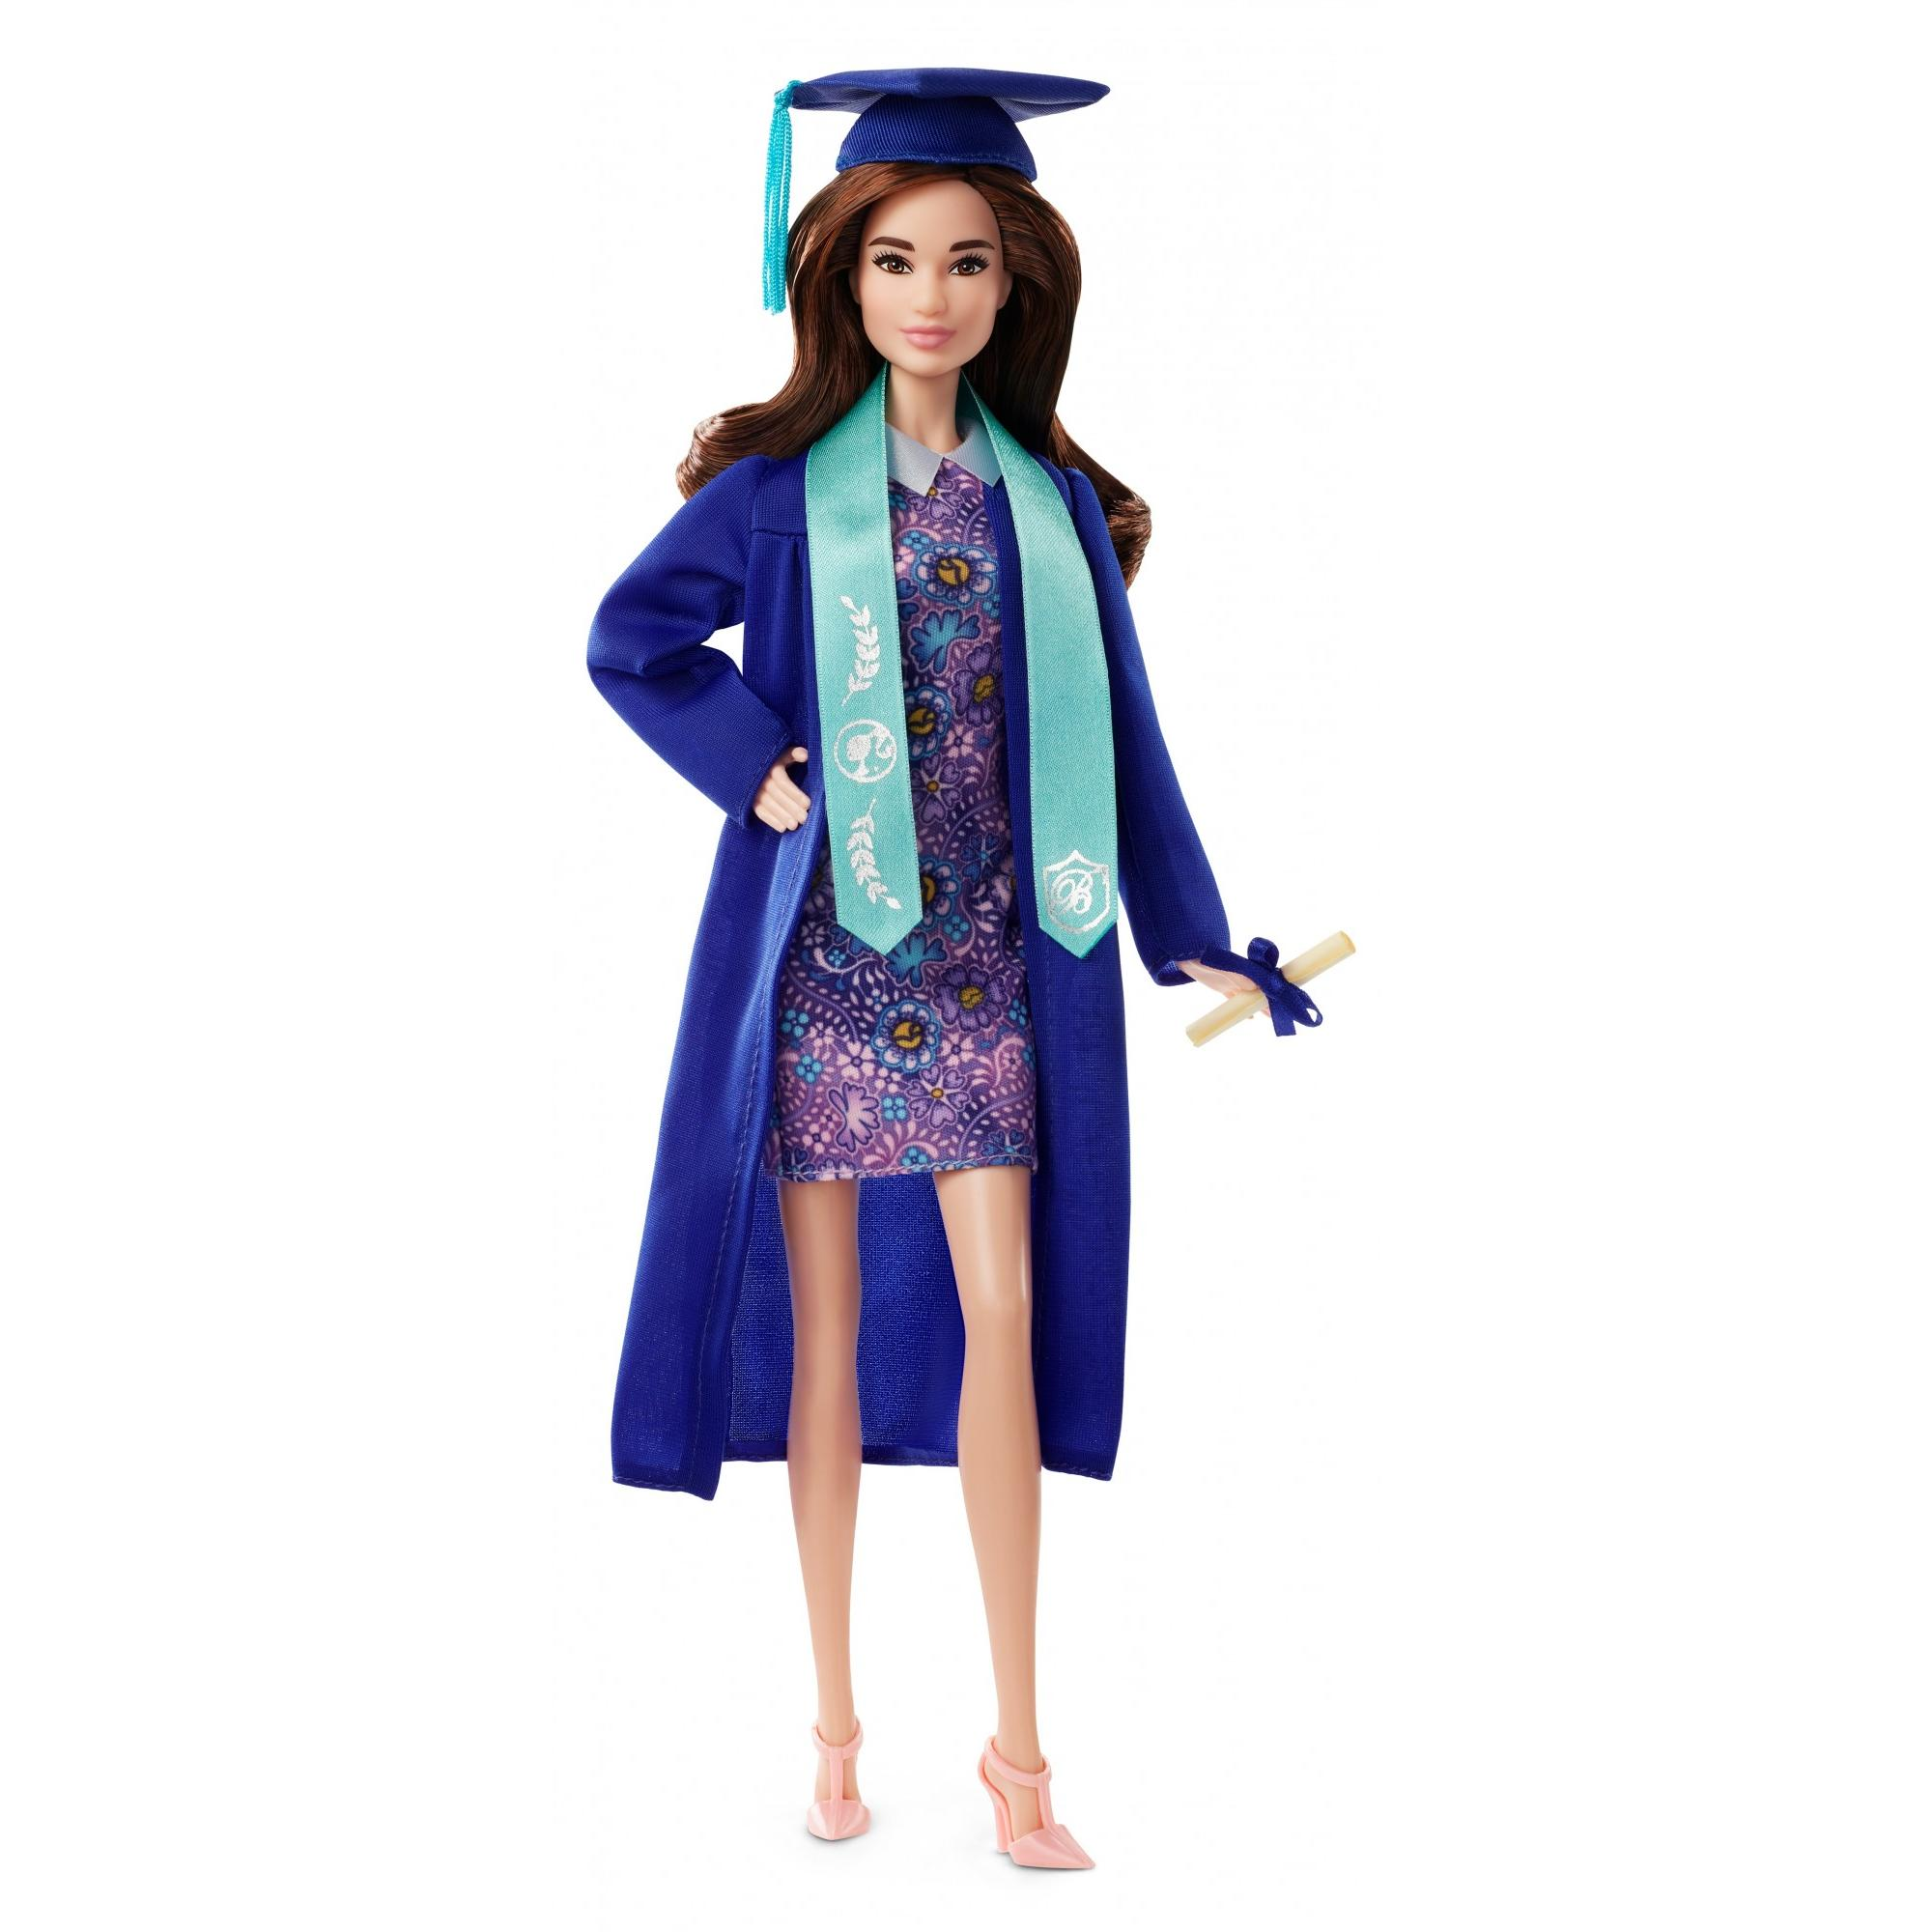 Barbie Graduation Day Cap & Gown Doll, Brunette Hair